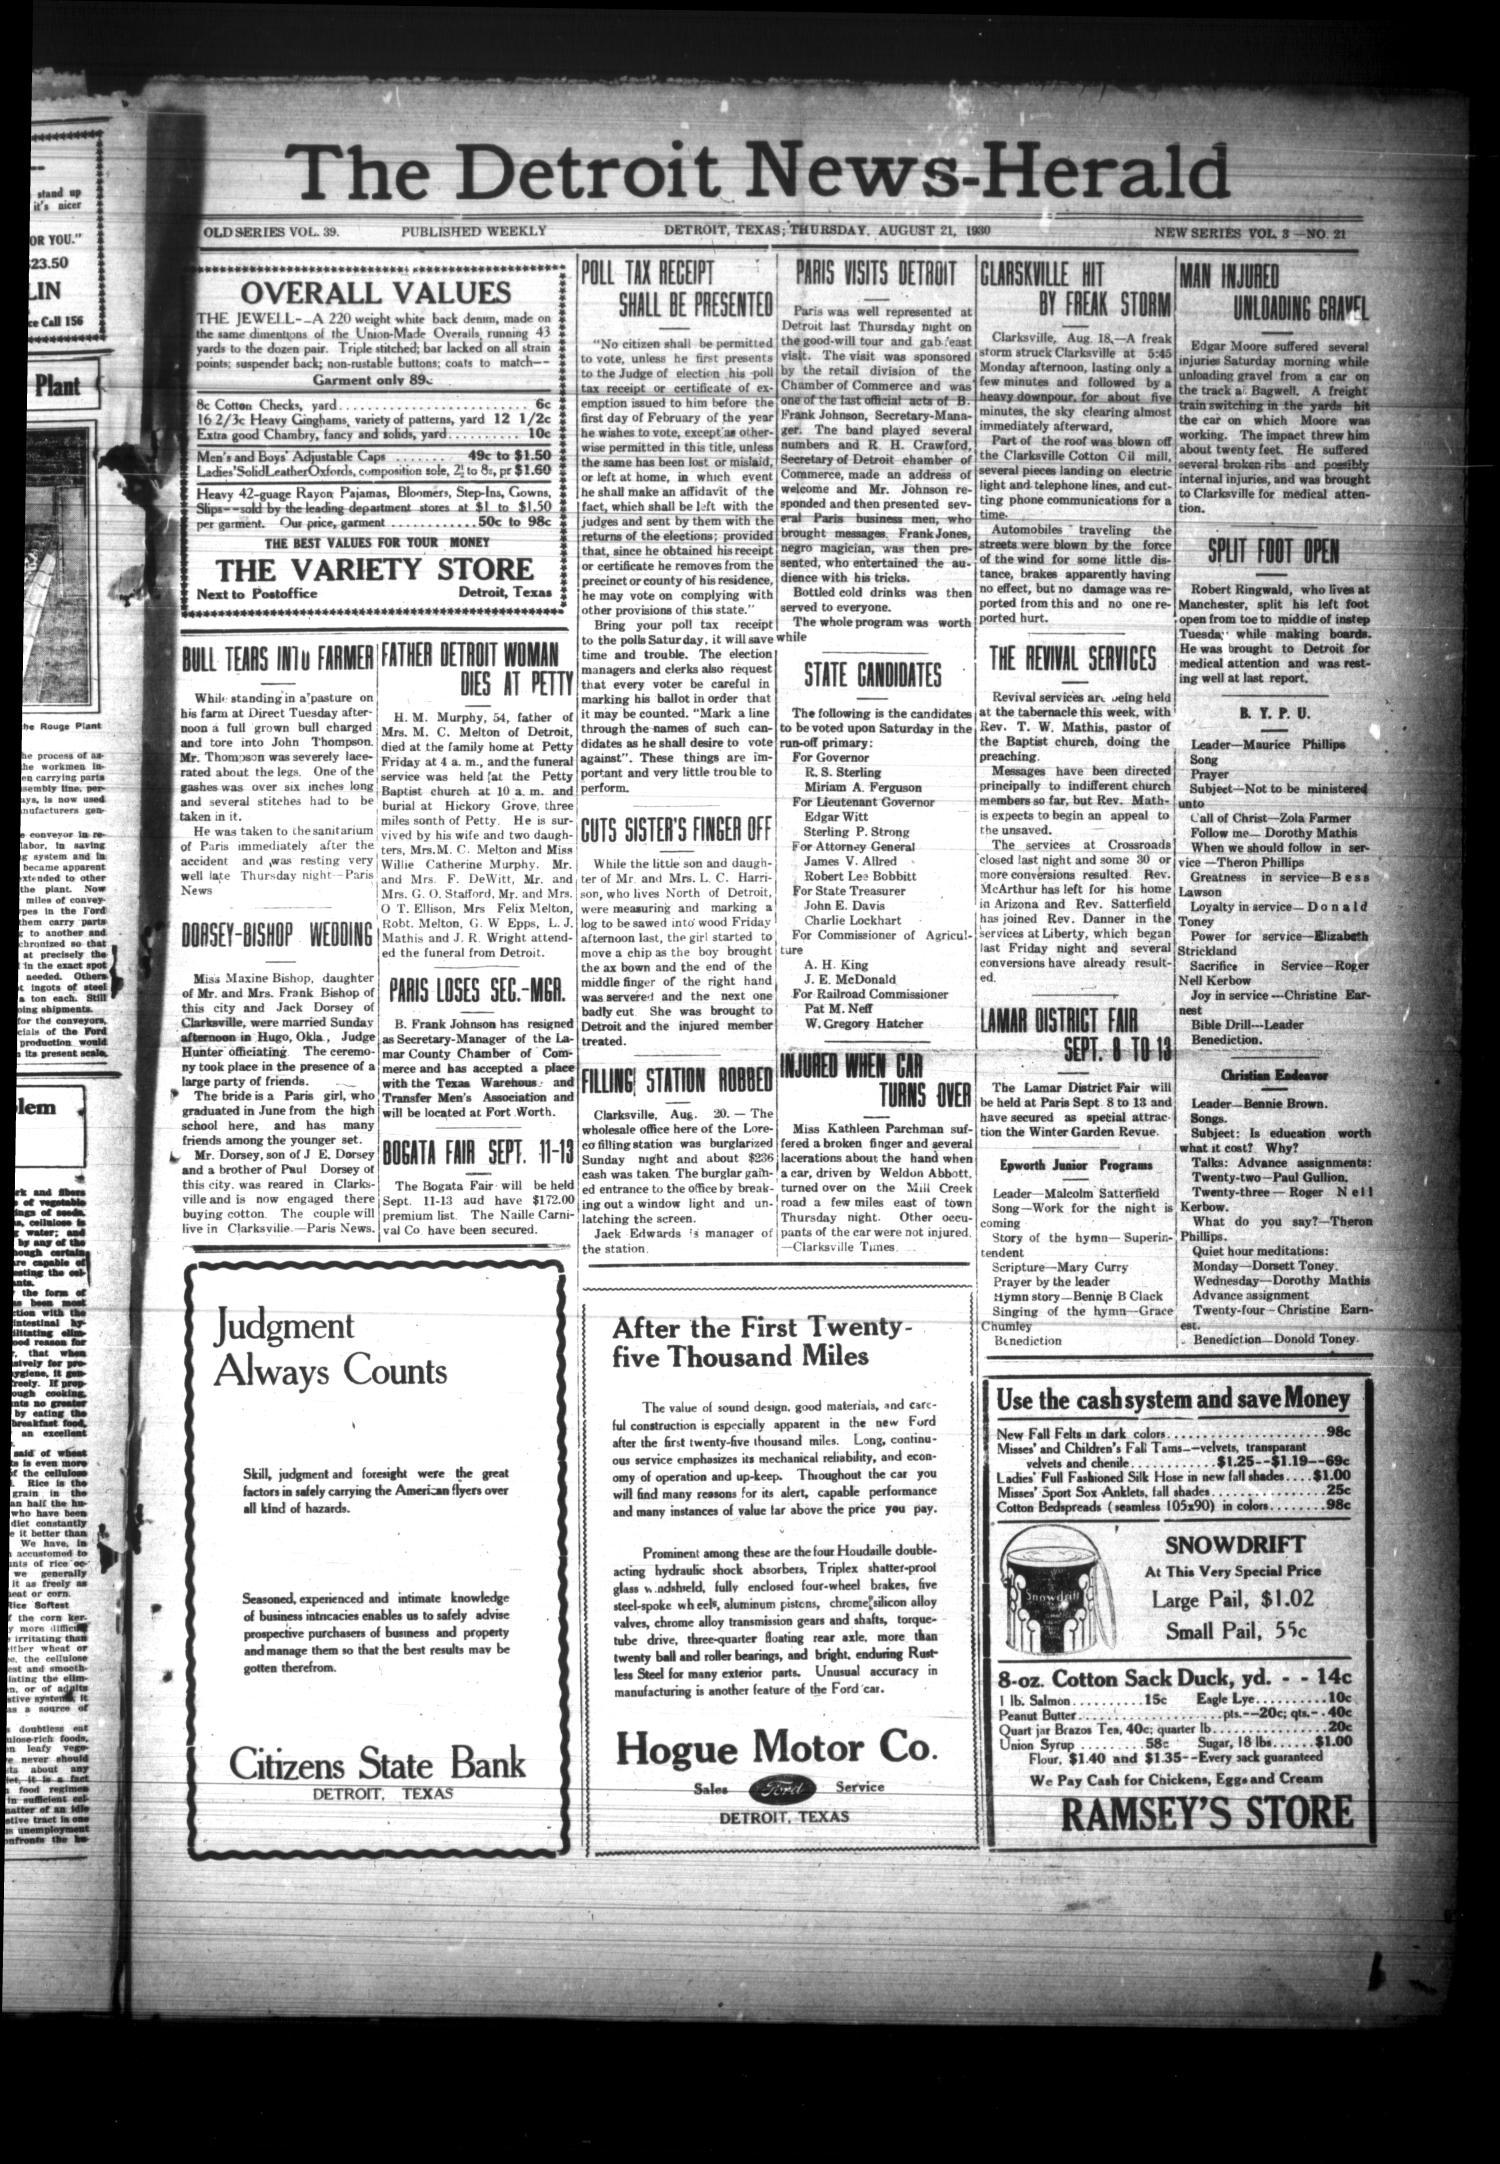 The Detroit News-Herald (Detroit. Tex.). Vol. 3. No. 21. Ed. 1 Thursday. August 21. 1930 - The Portal to Texas History